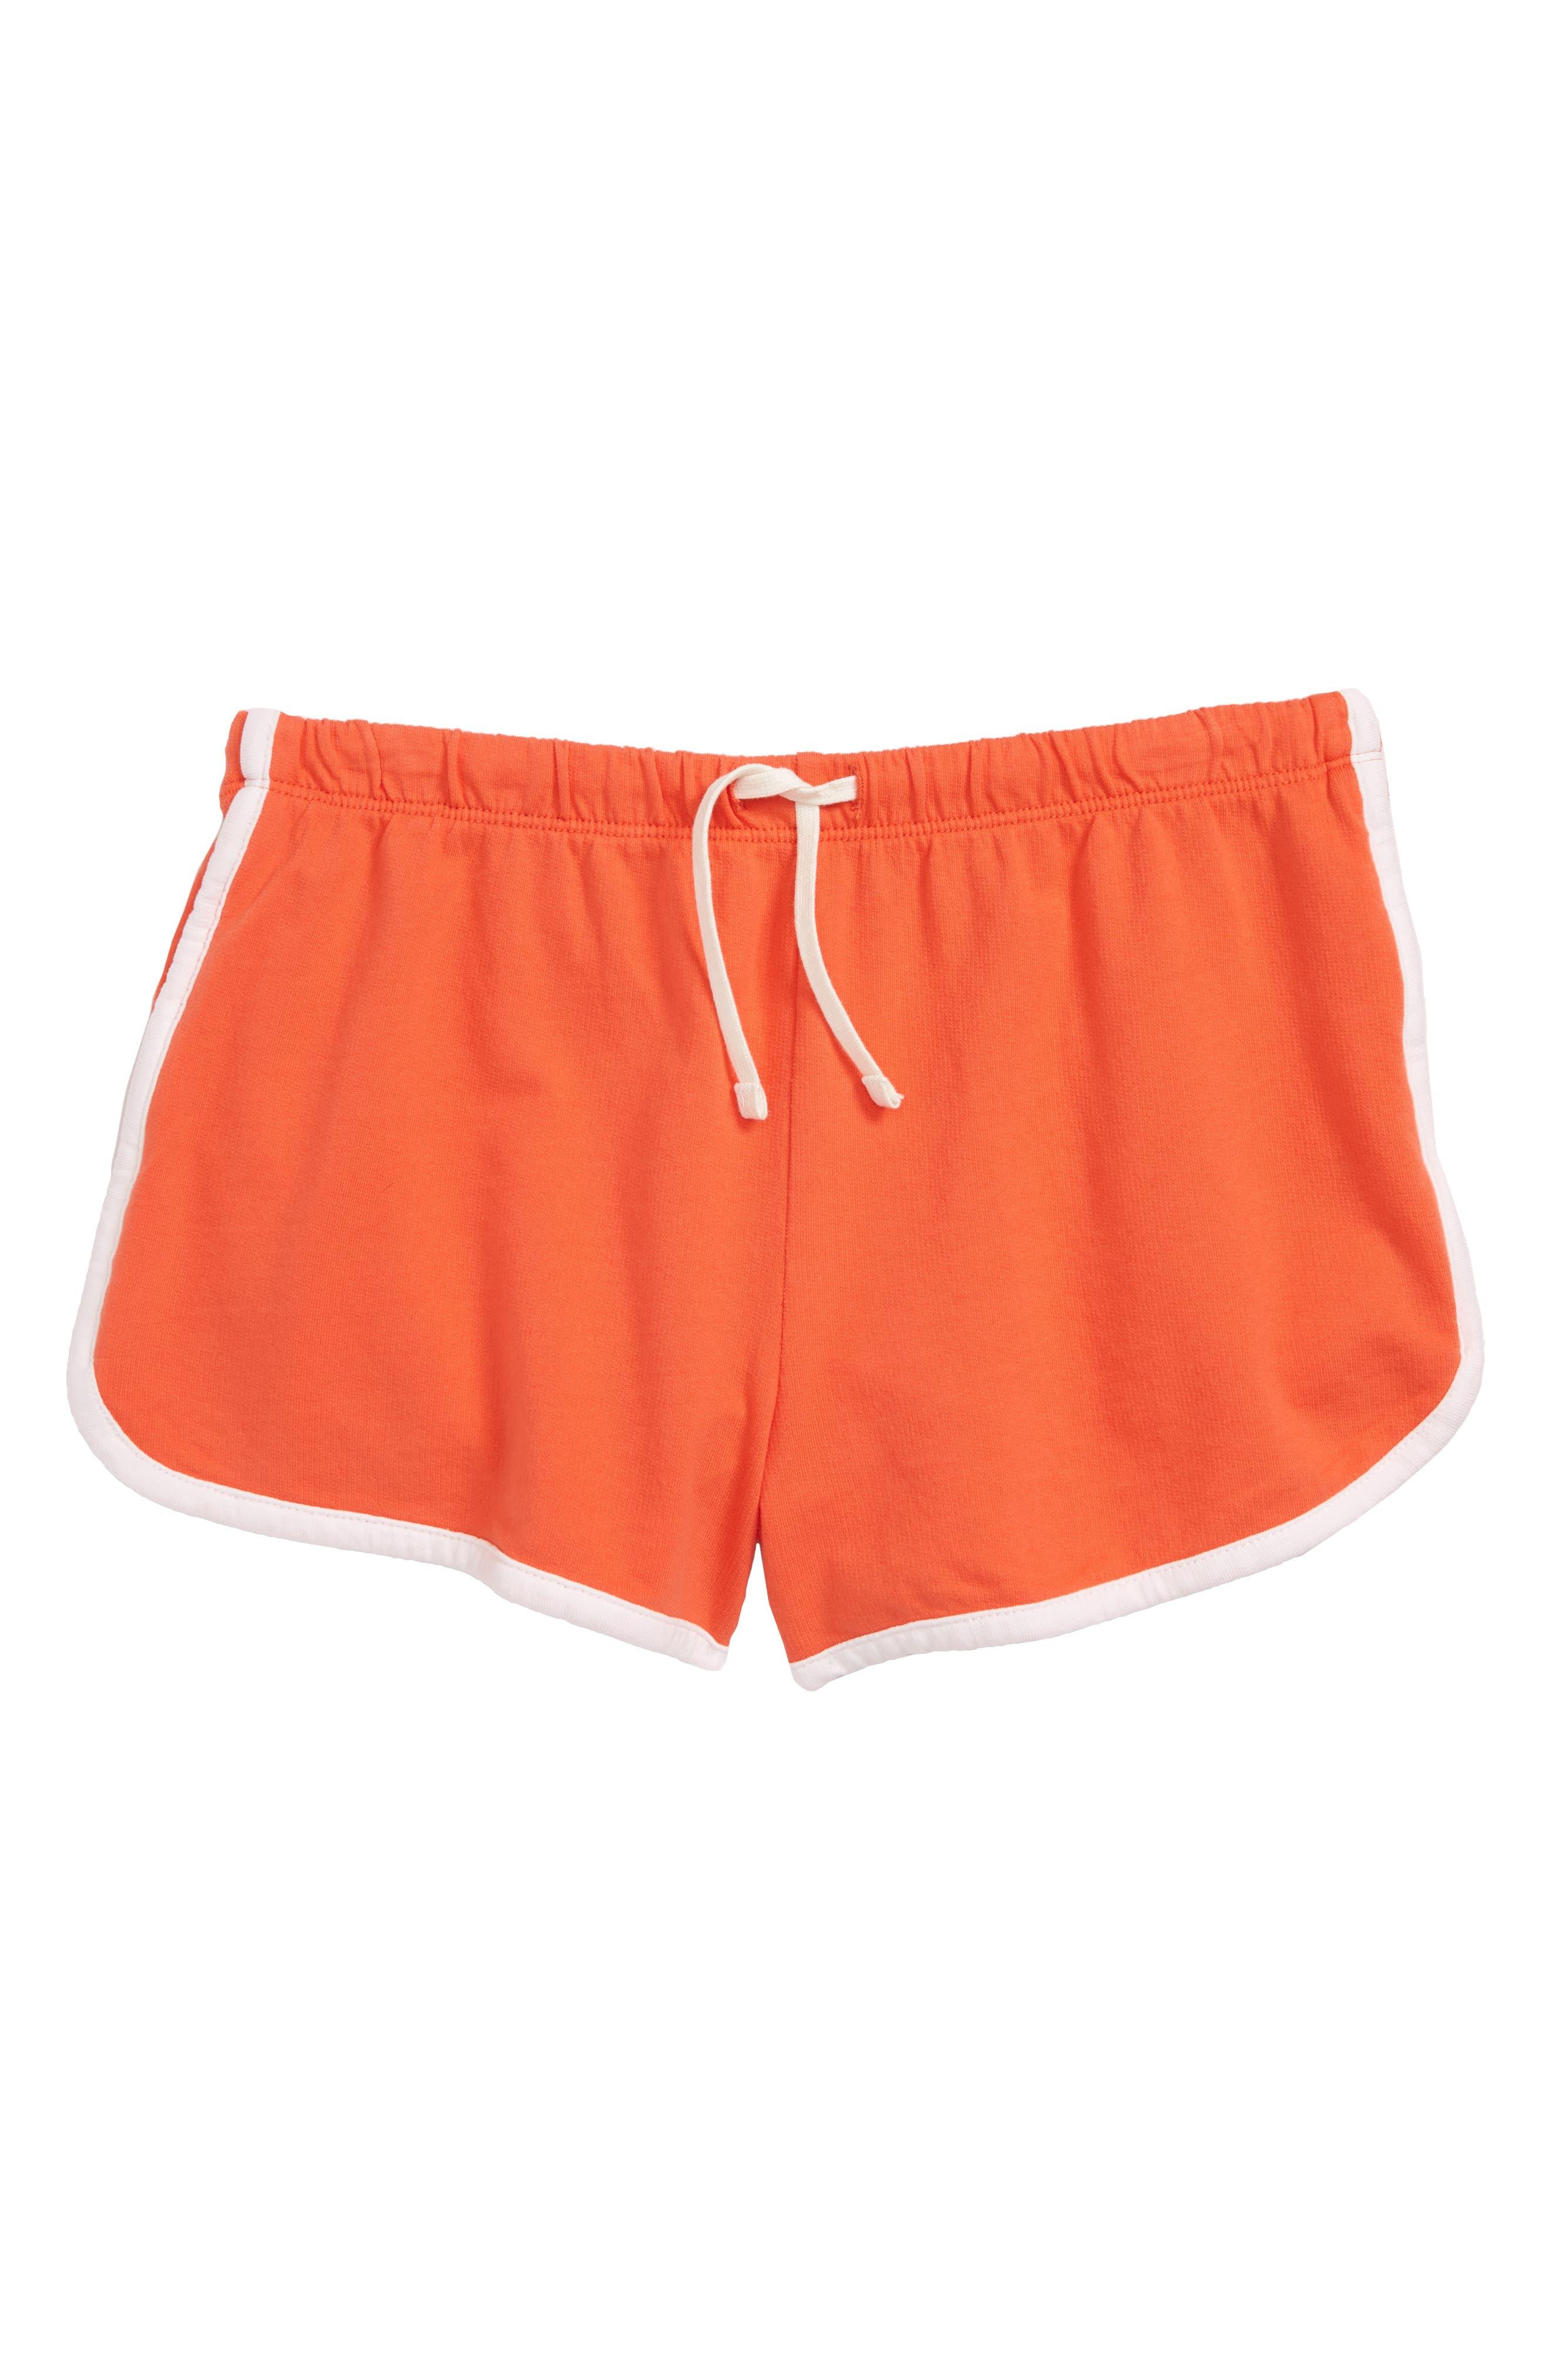 Cotton Dolphin Shorts,                             Main thumbnail 6, color,